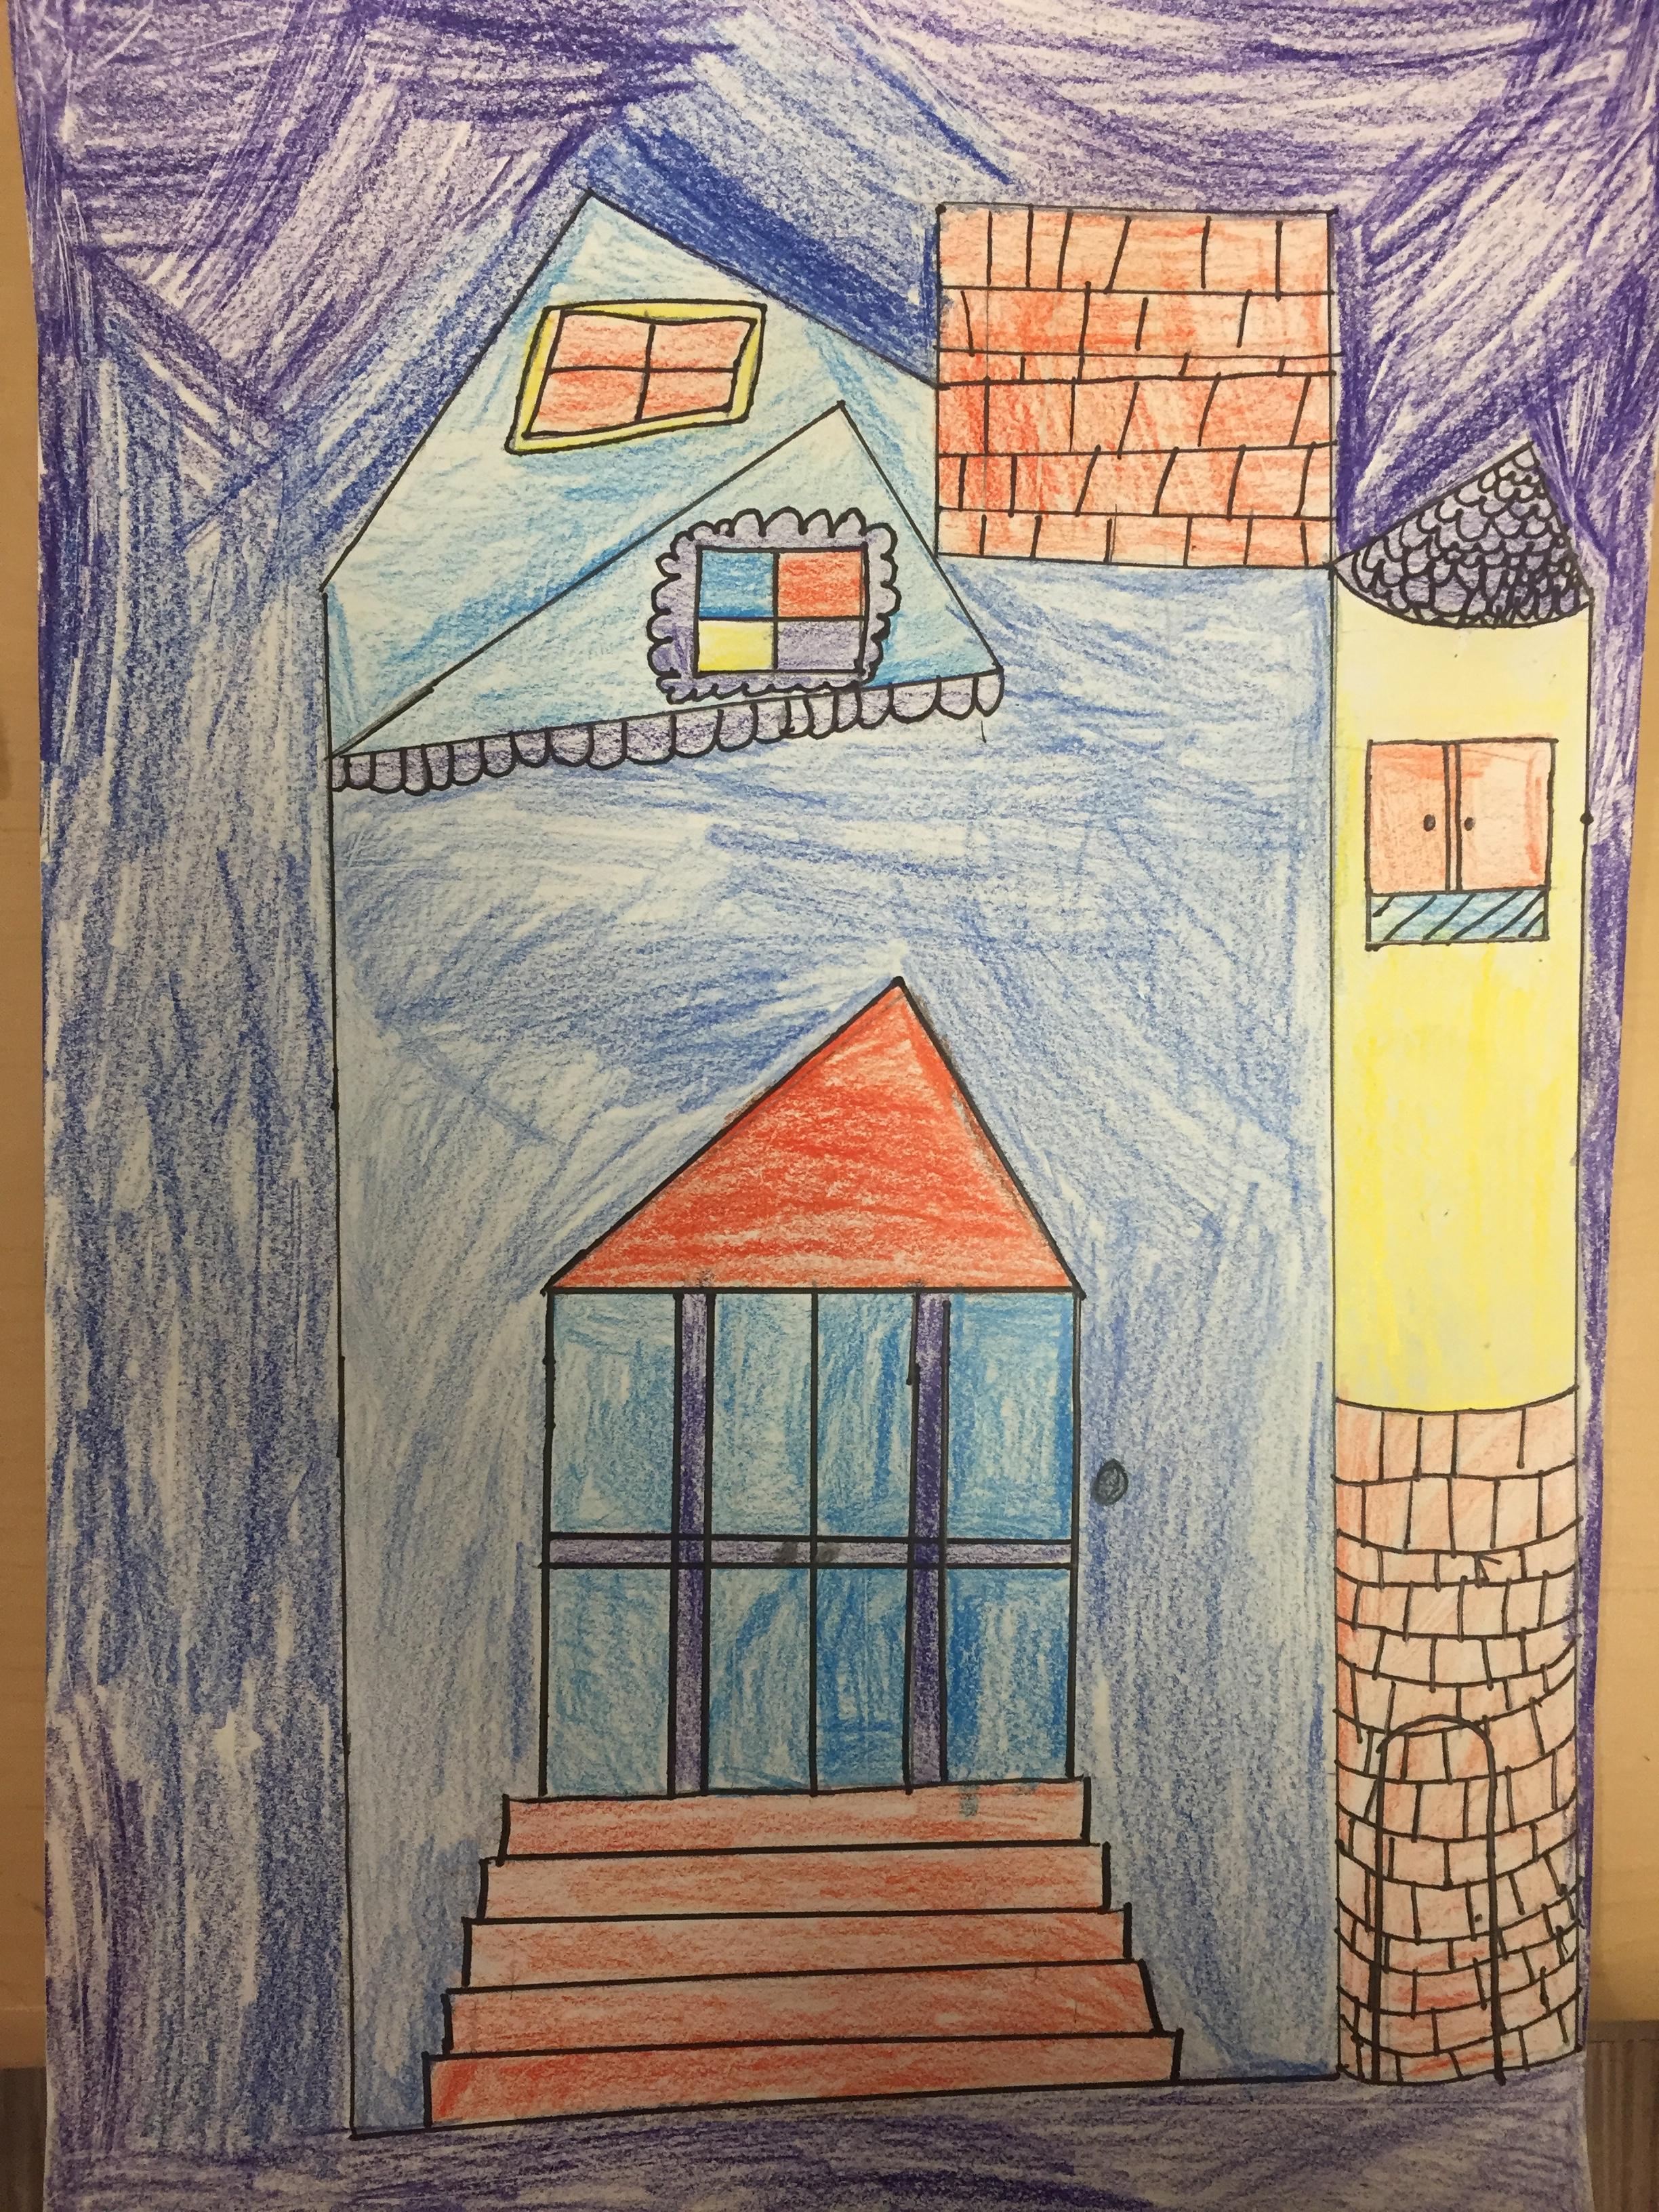 Ashlly, 4th Grade, Mr. Crossman's Class